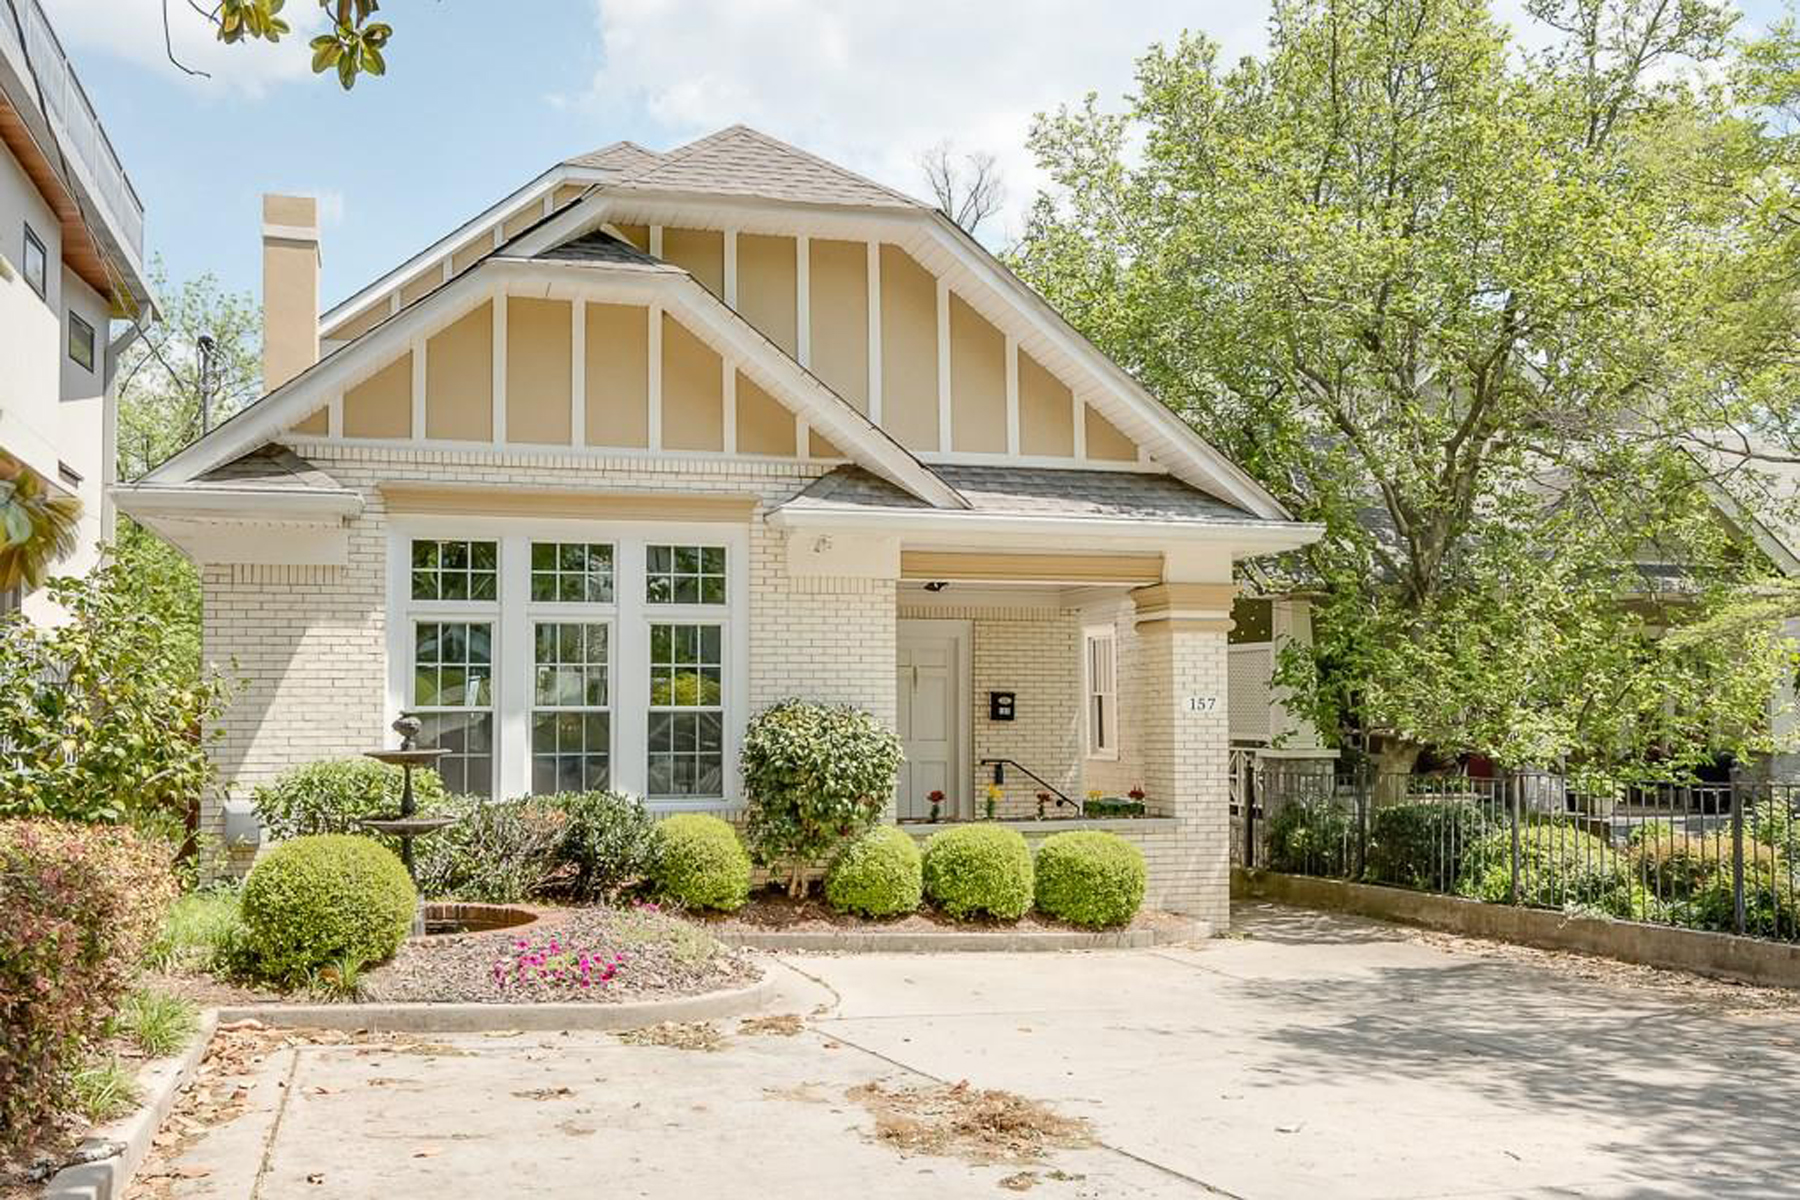 Single Family Home for Sale at Spacious Ansley Park Bungalow 157 The Prado, Ansley Park, Atlanta, Georgia, 30309 United States